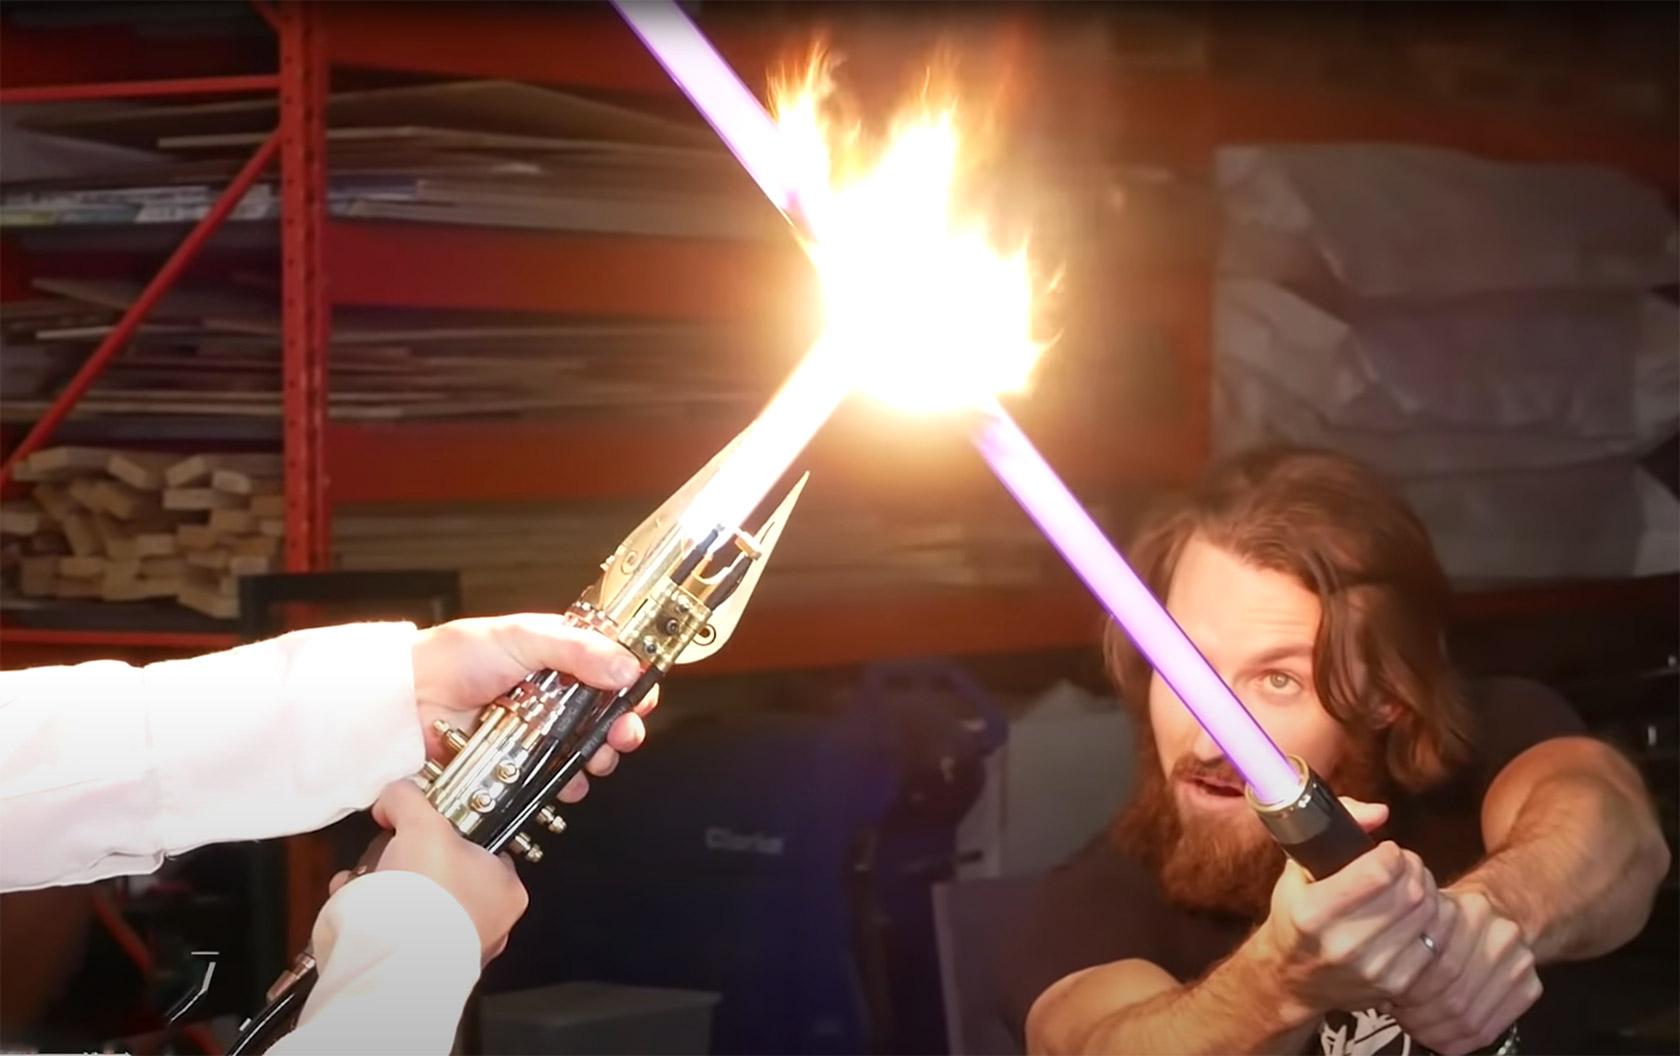 Plasma Lightsaber Test